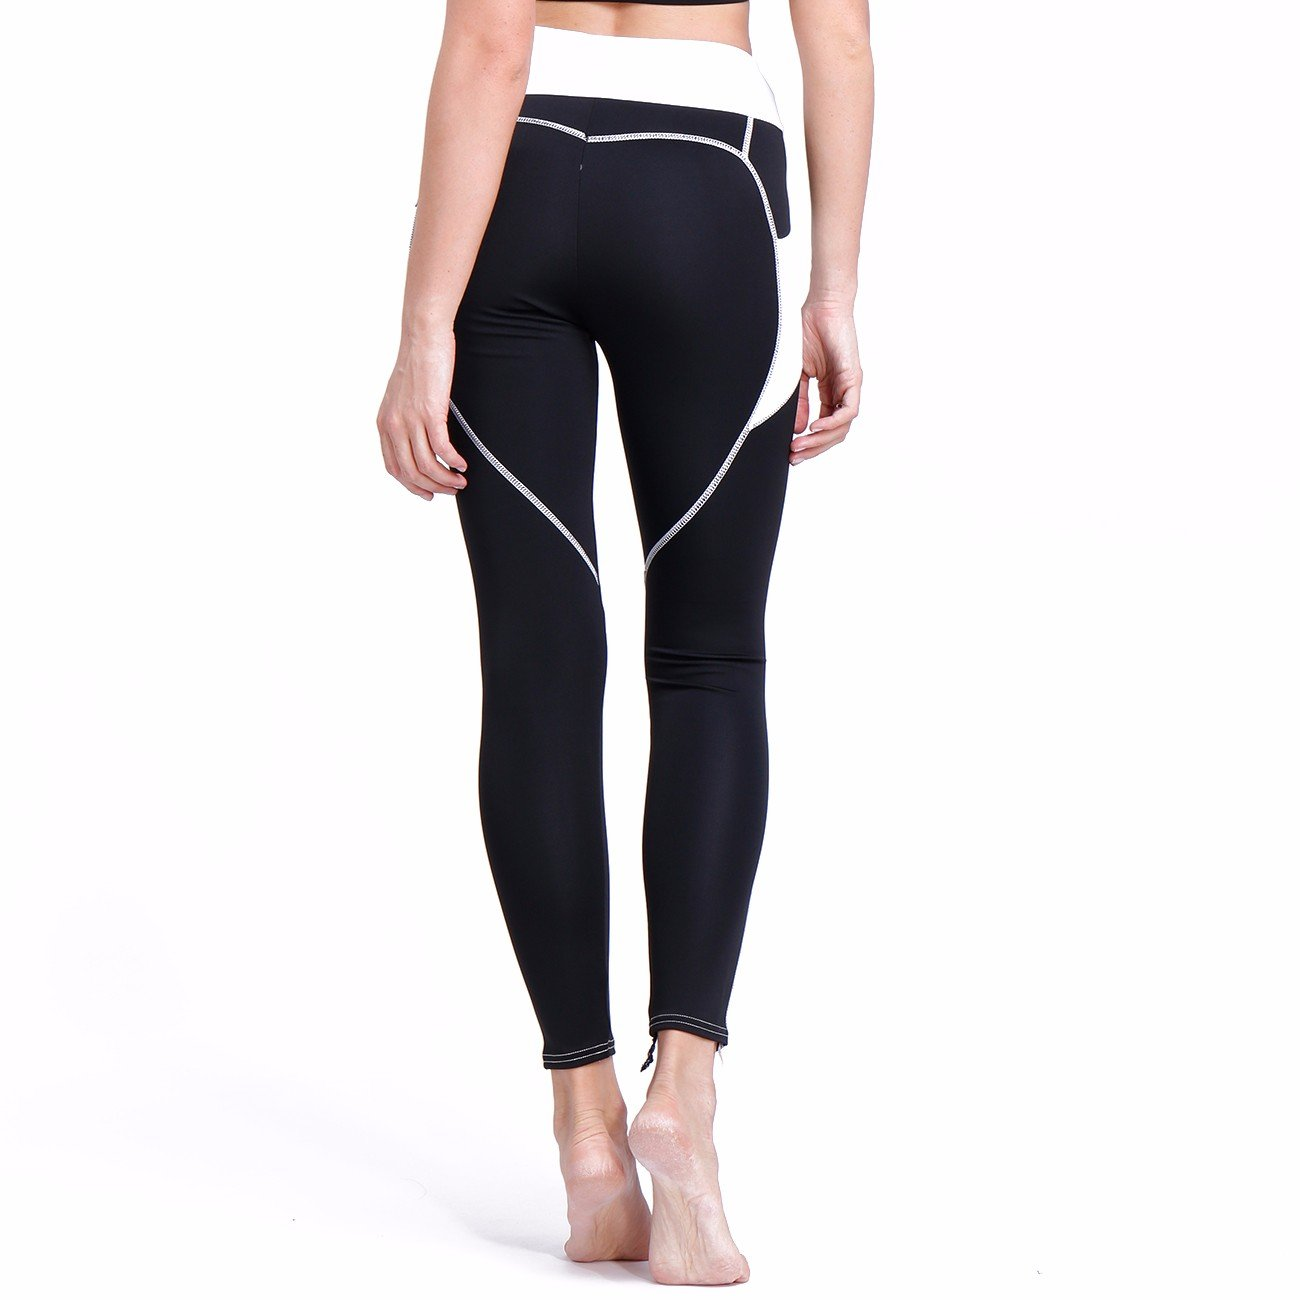 2018 Hot! Women's Fitness Leggings Workout Yoga Pants Capris Stretch Sportwear CFR